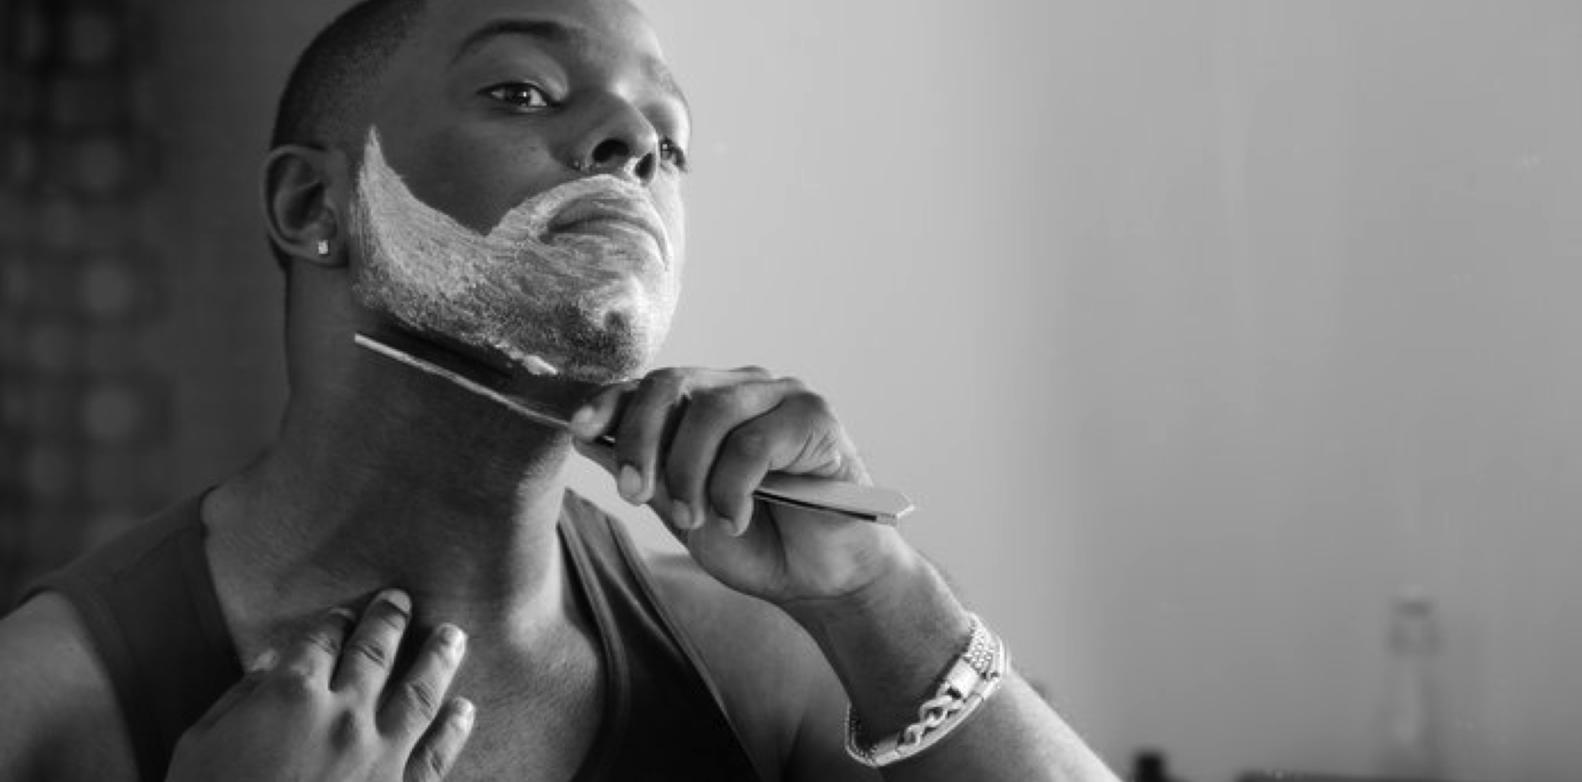 Geno Young shaving and looking hot.jpg